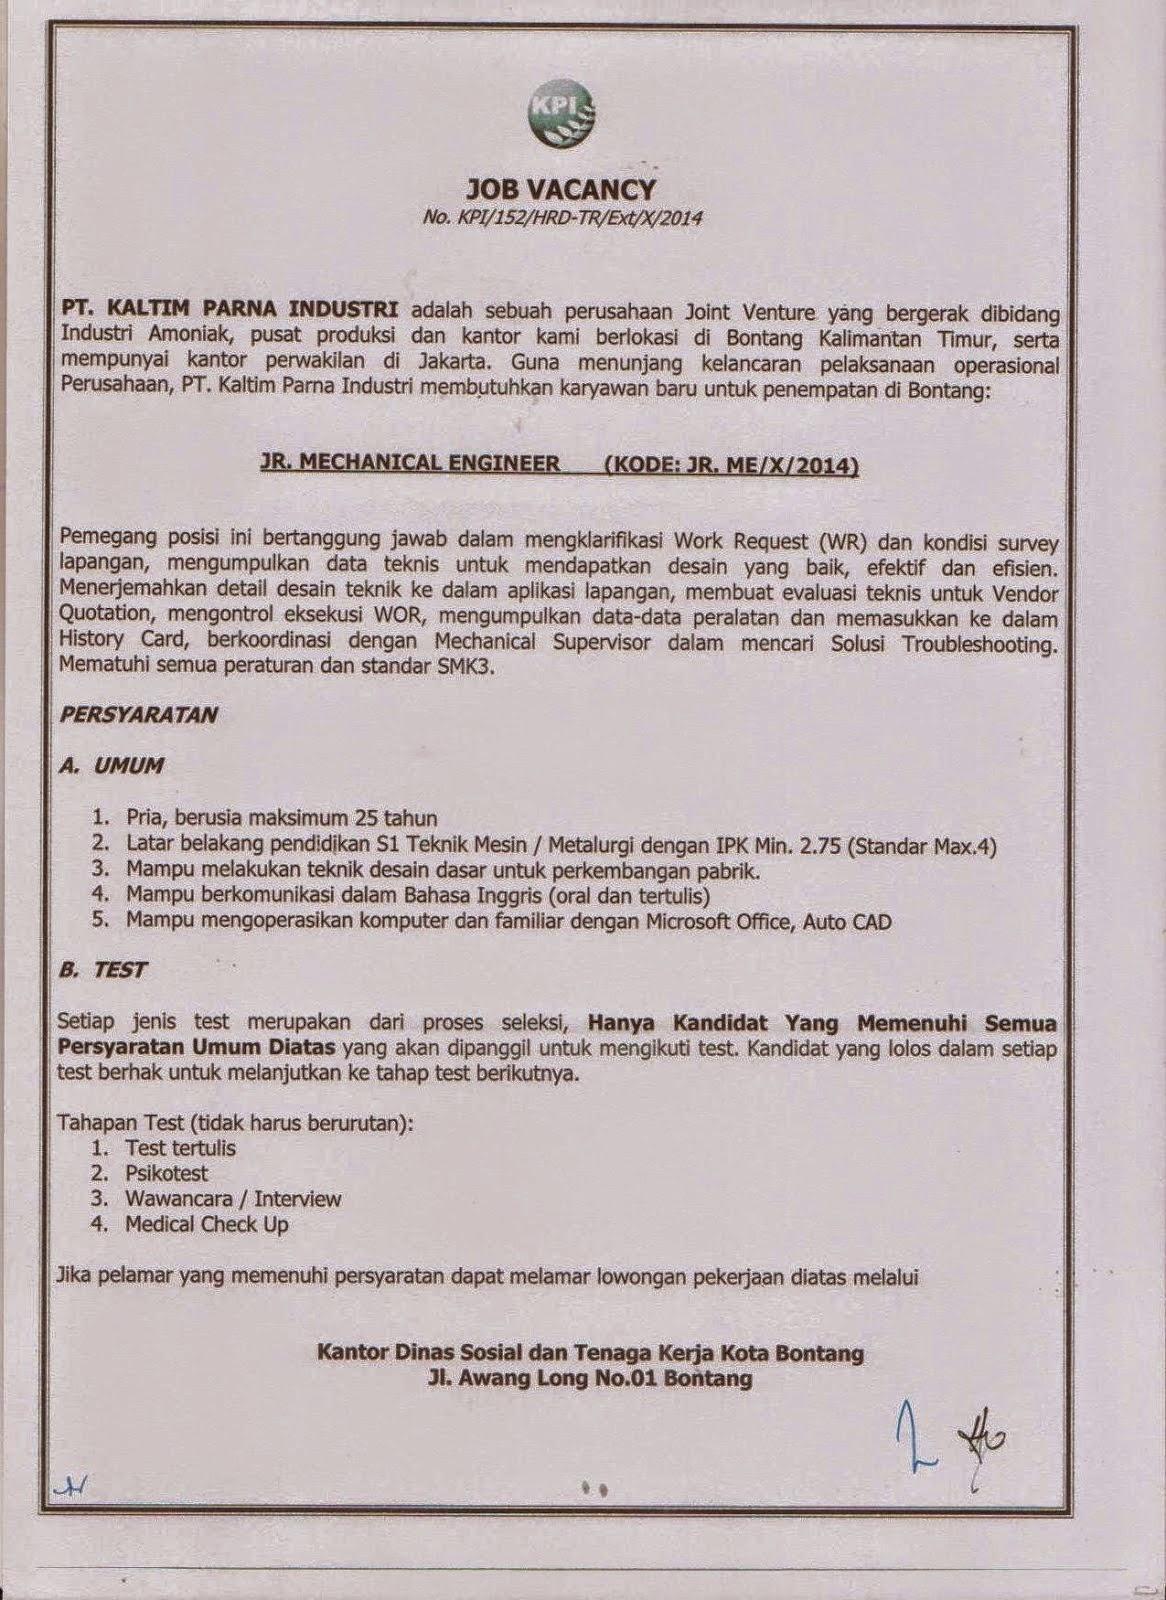 Lowongan Kerja PT Kaltim Parna Industri Oktober 2014 : Junior Mechanical Engineer